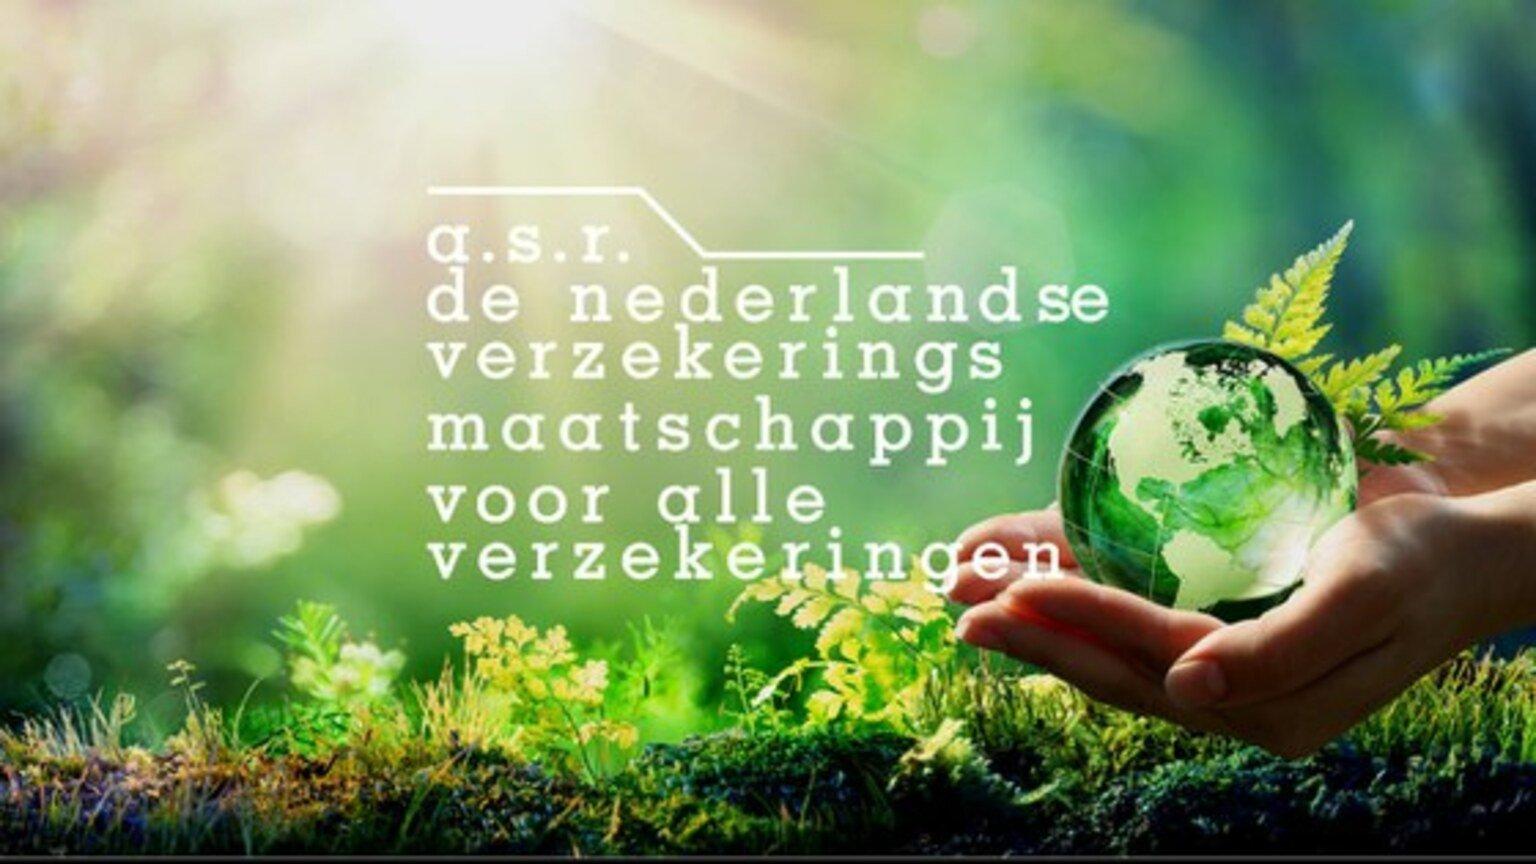 asr-netherlands-cch-tagetiks-ifrs17-solution